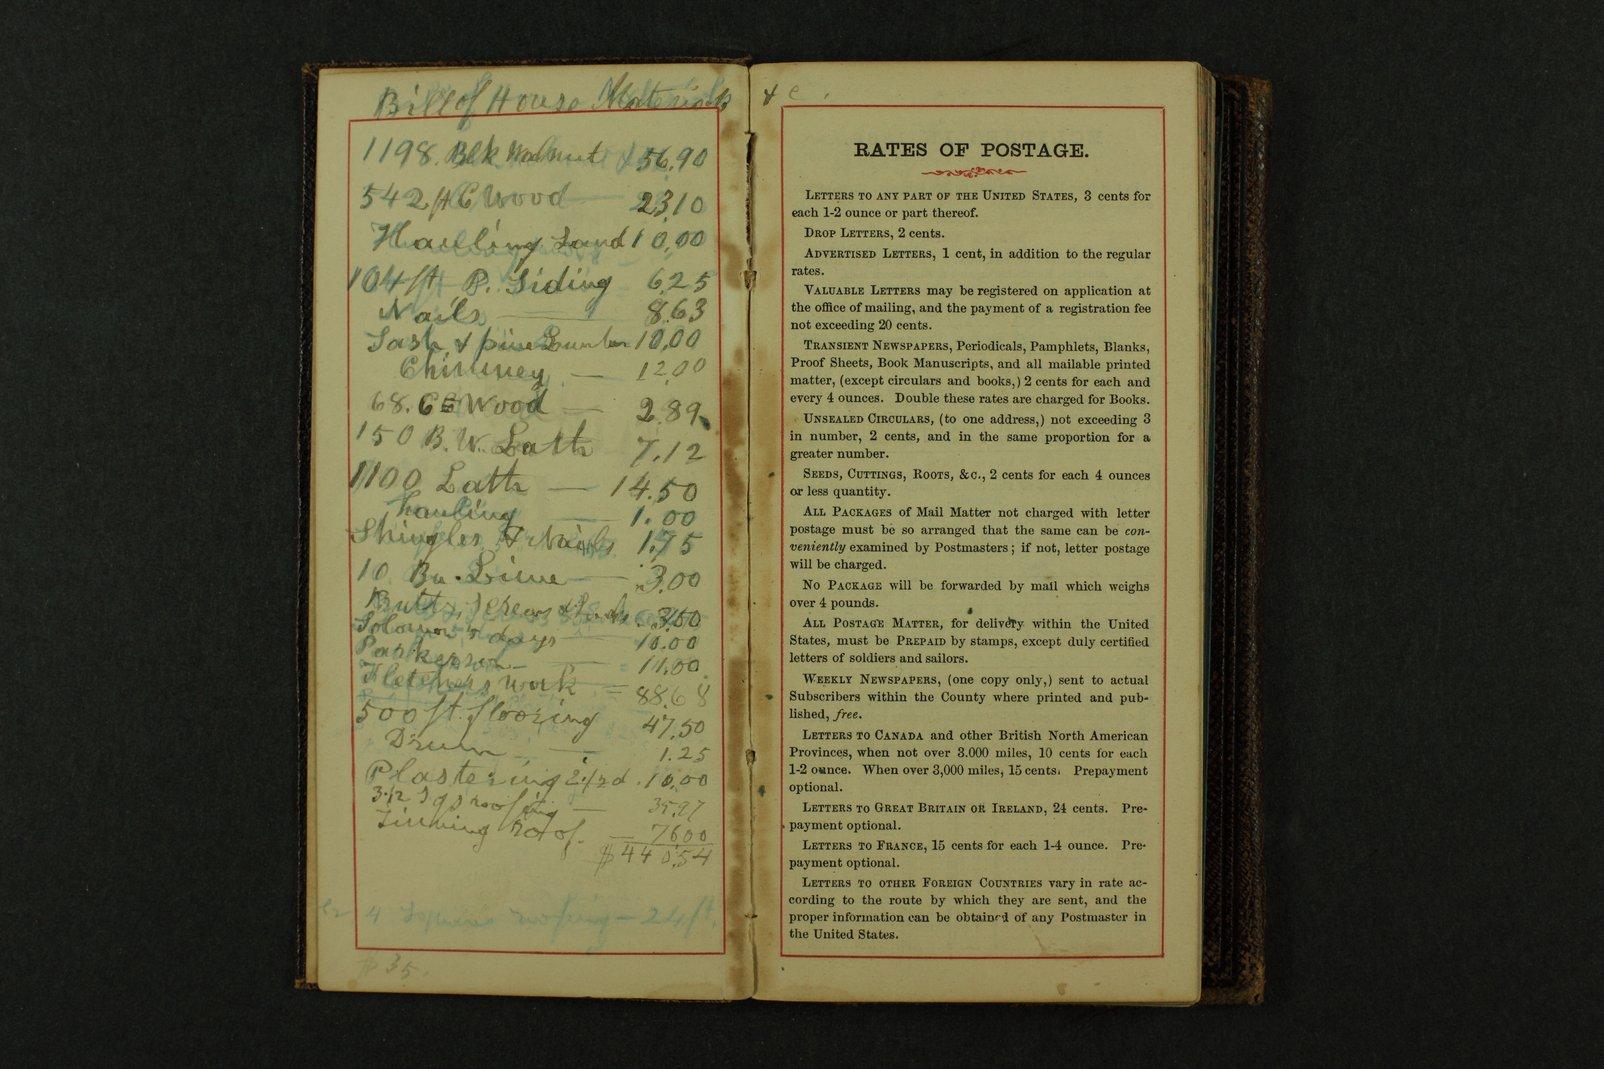 Isaac Tichenor Goodnow diary - 4